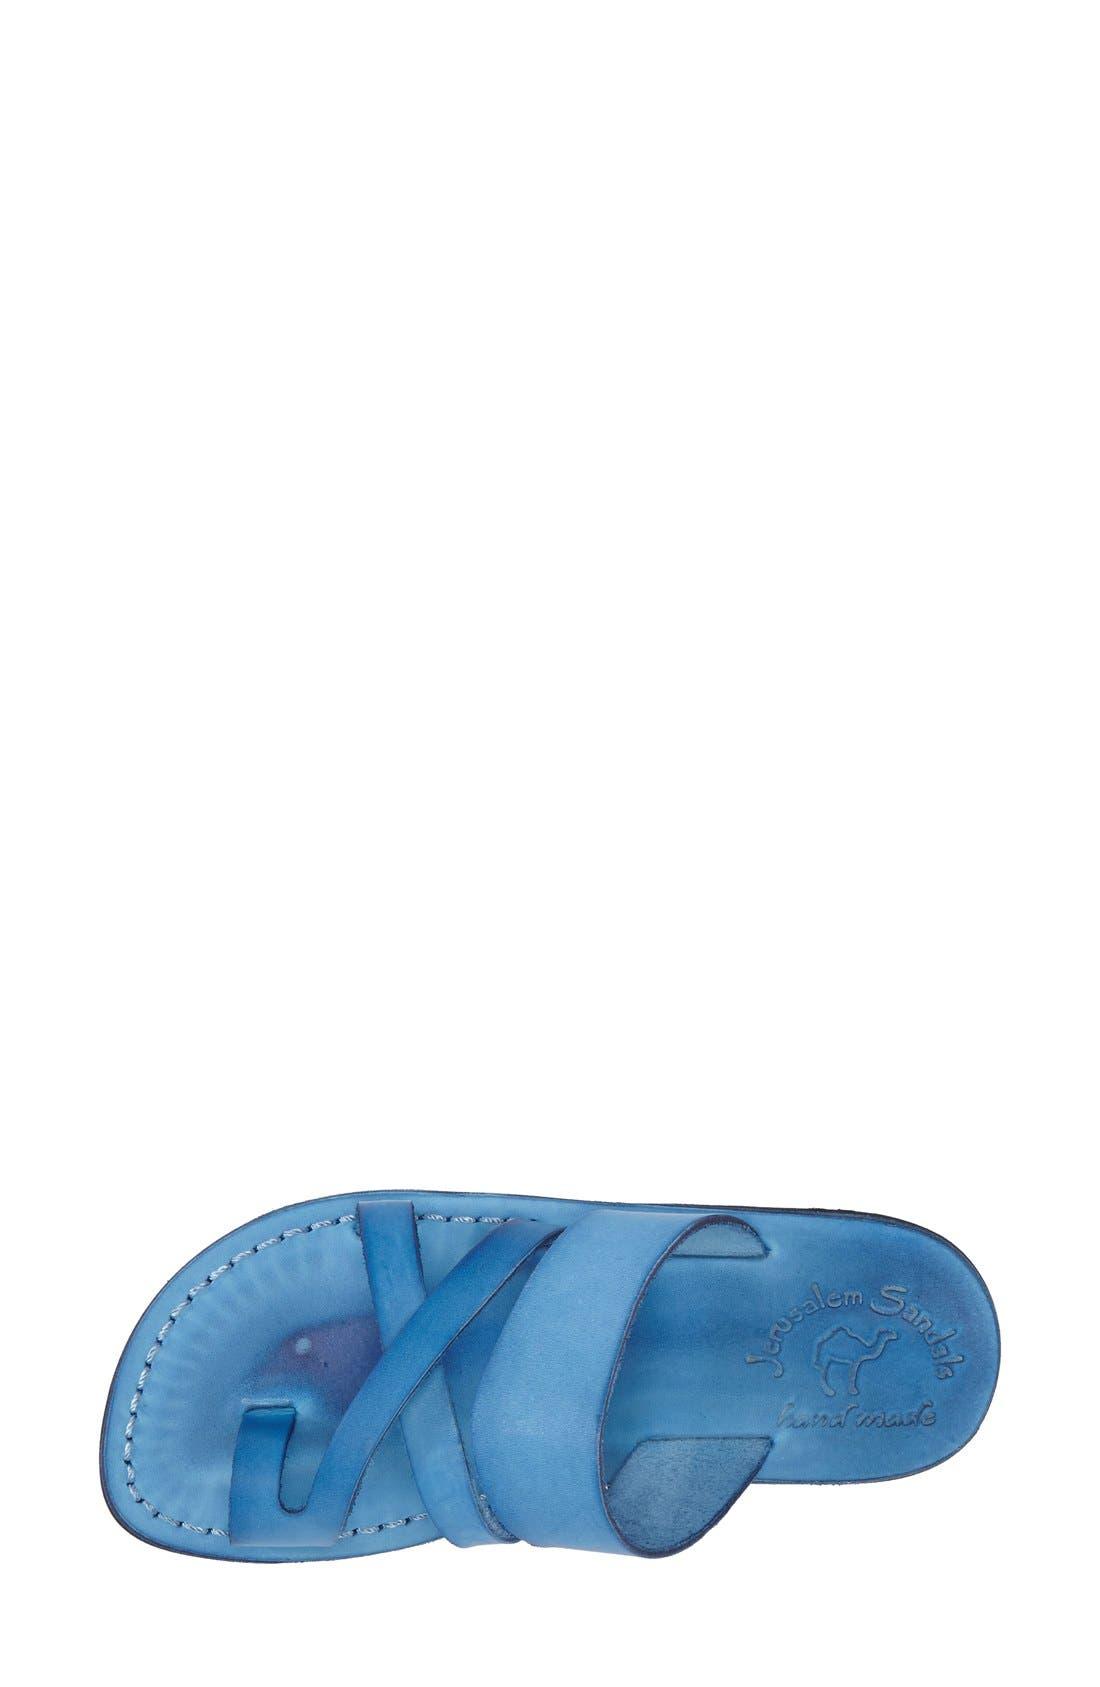 'The Good Shepard' Leather Sandal,                             Alternate thumbnail 14, color,